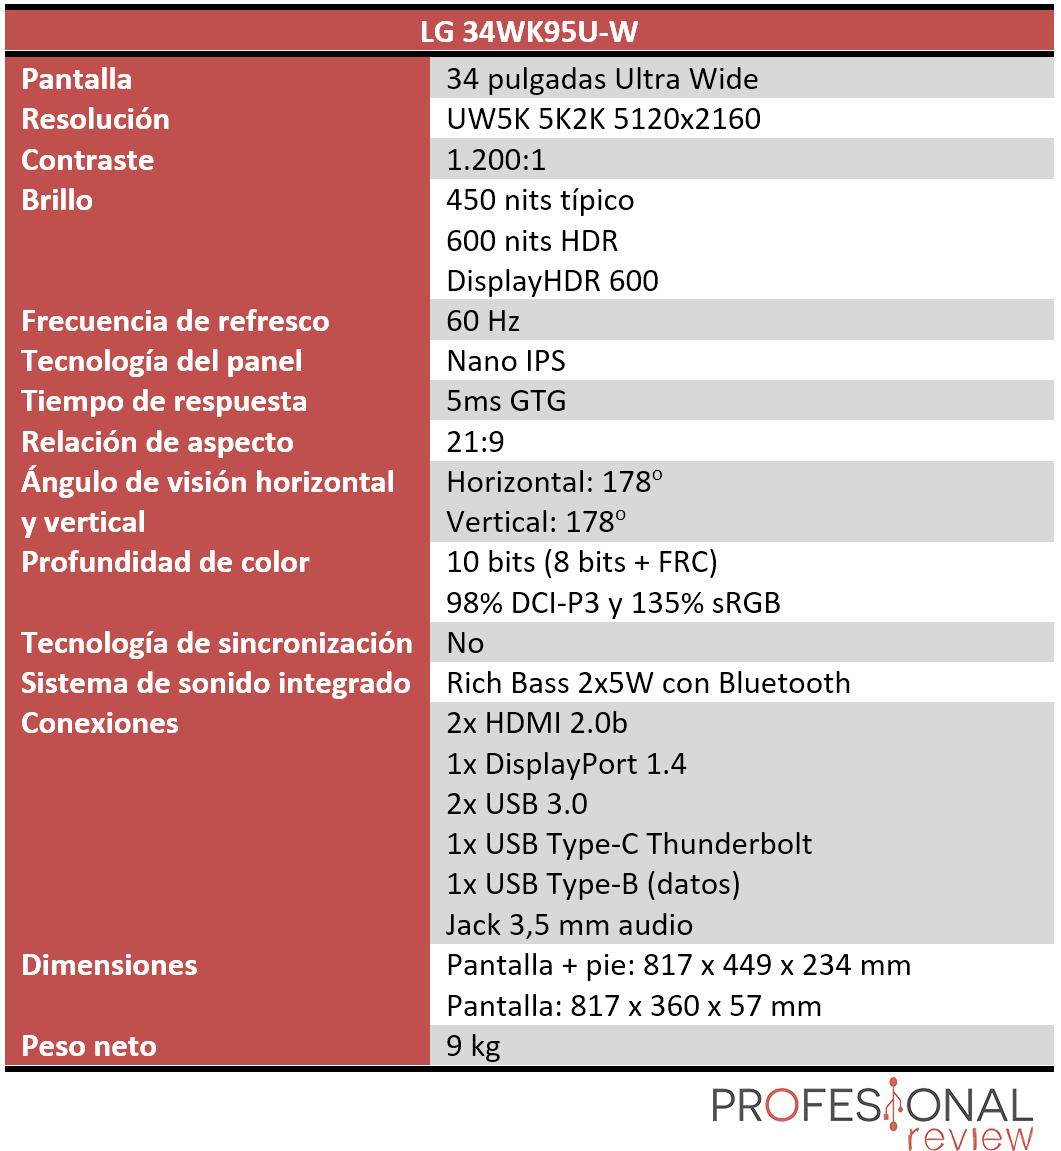 LG 34WK95U-W Características